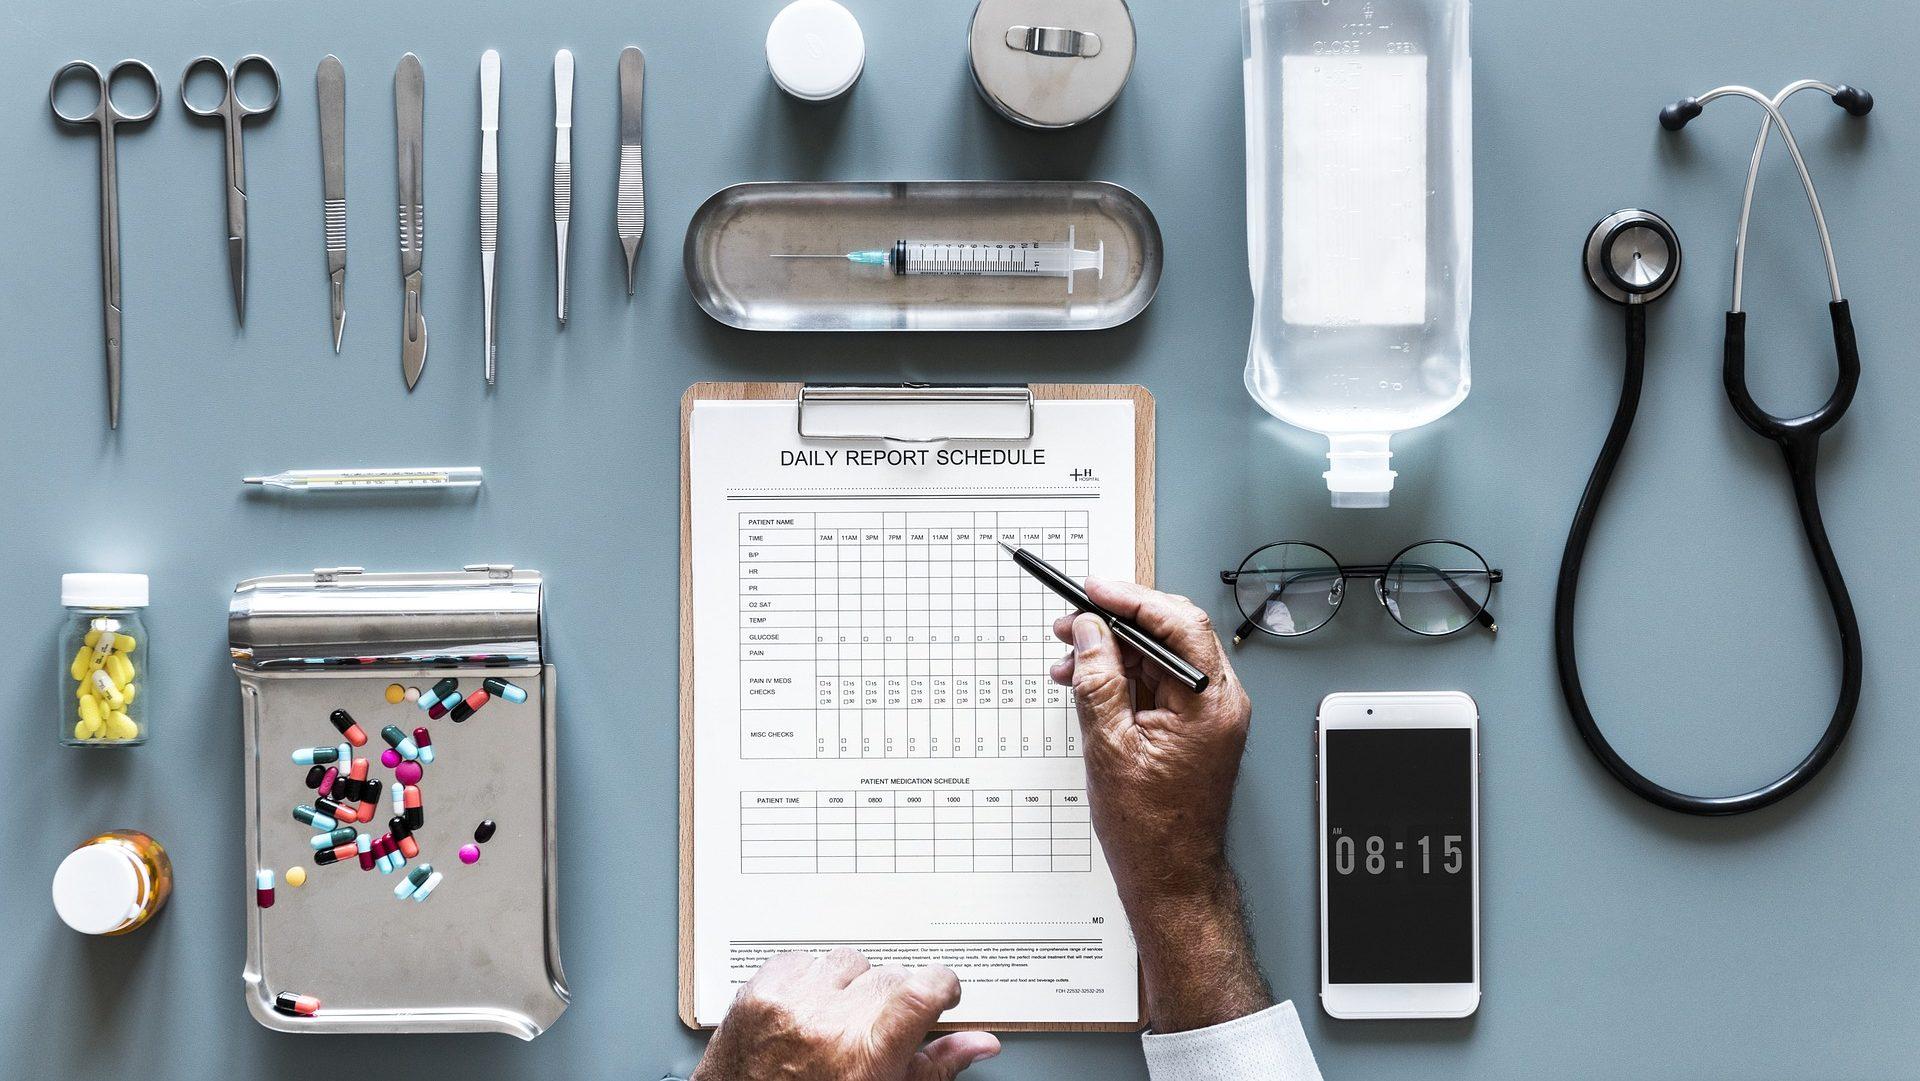 Gulf Medical Technologies